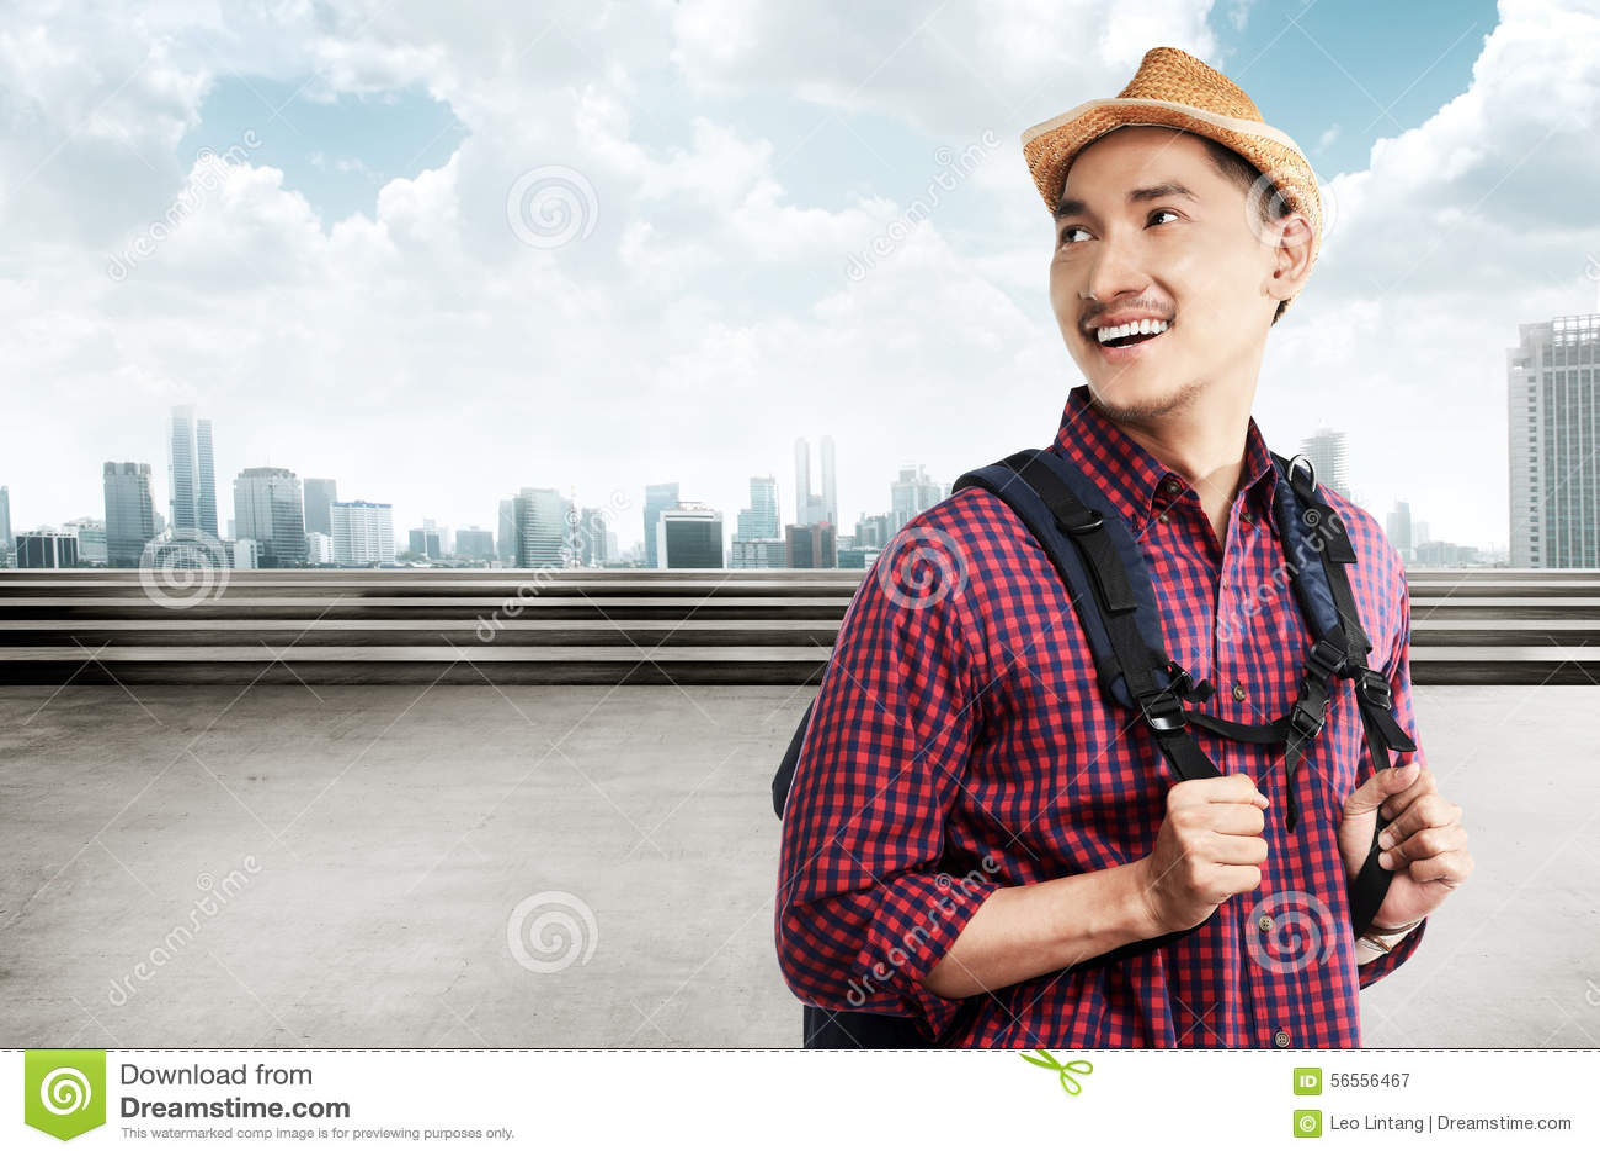 Download Ο ασιατικός τουρίστας φέρνει το χαμόγελο σακιδίων πλάτης Στοκ Εικόνα - εικόνα από ευτυχής, πορτρέτο: 56556467